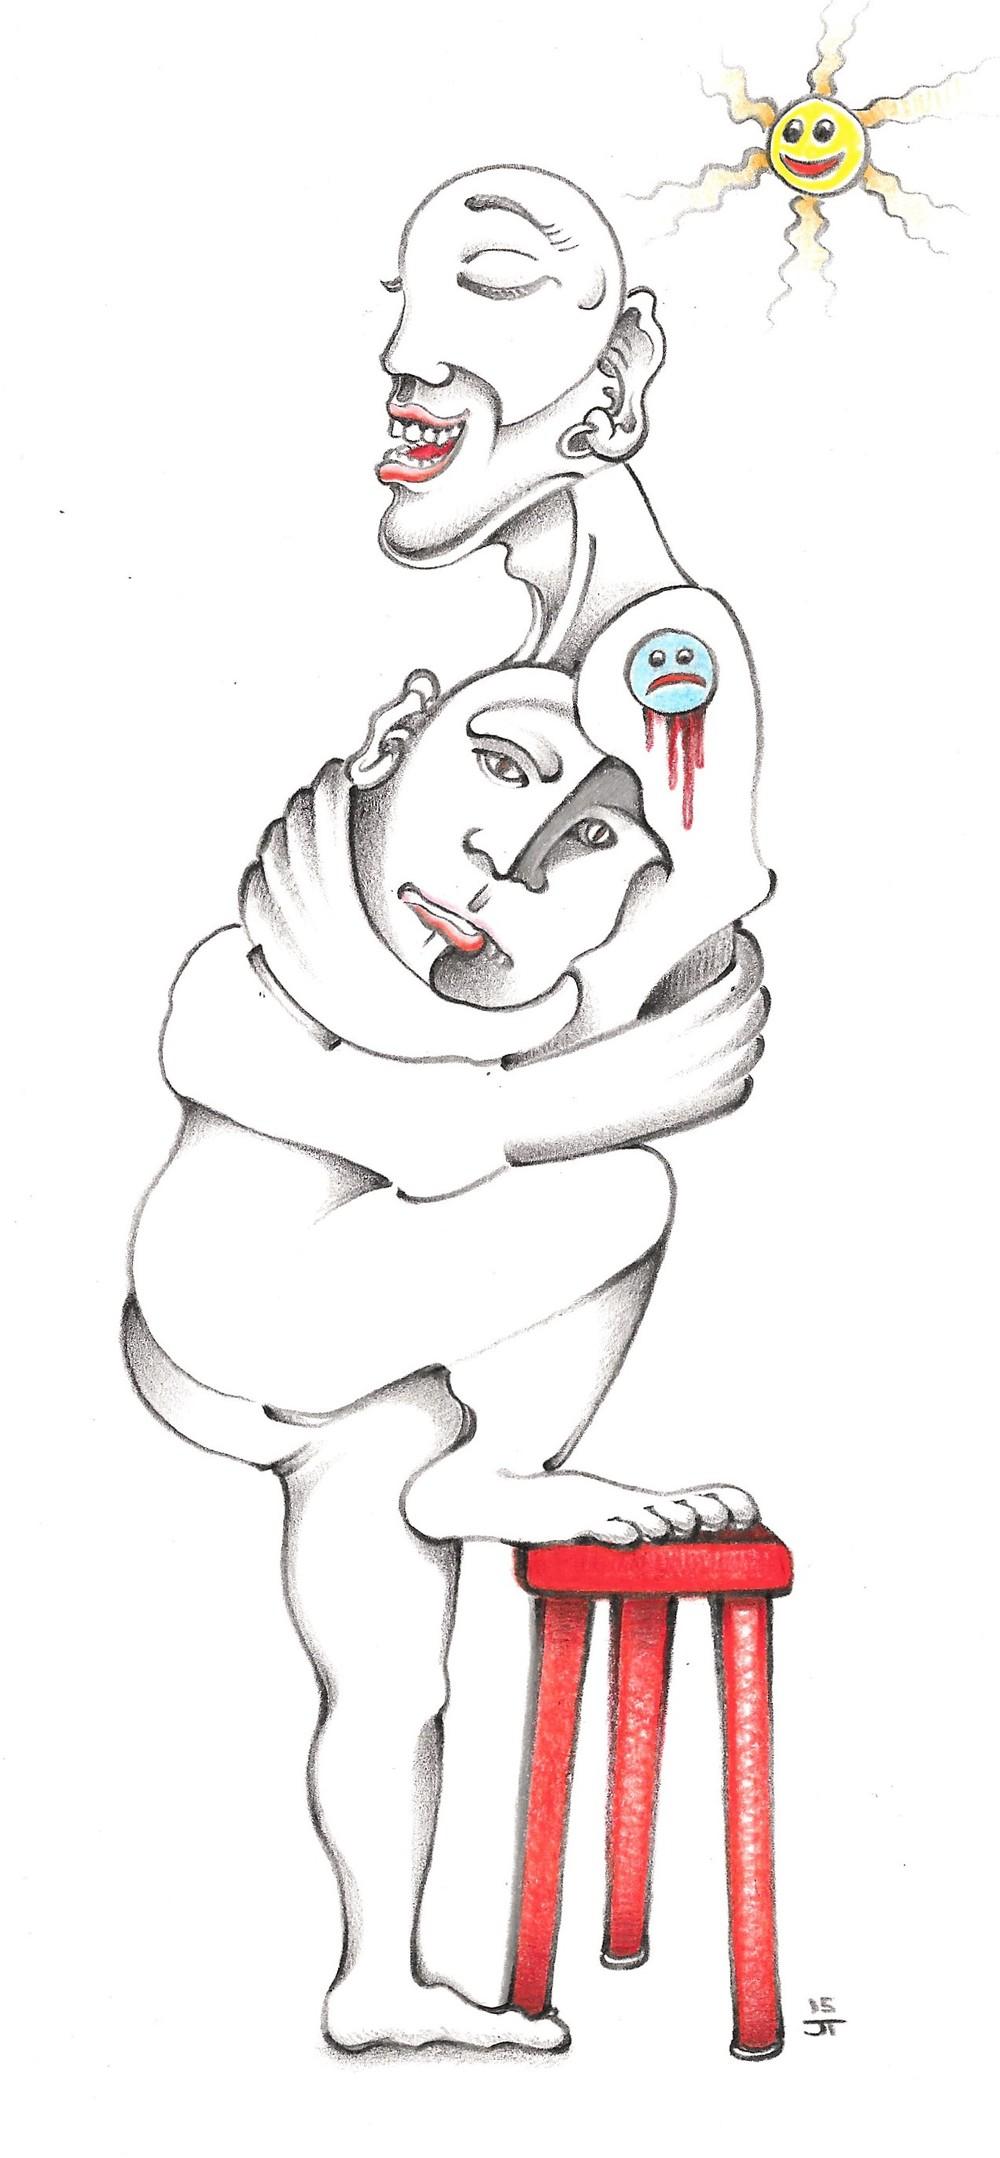 """It's Okay"" 2015, pencil on paper."